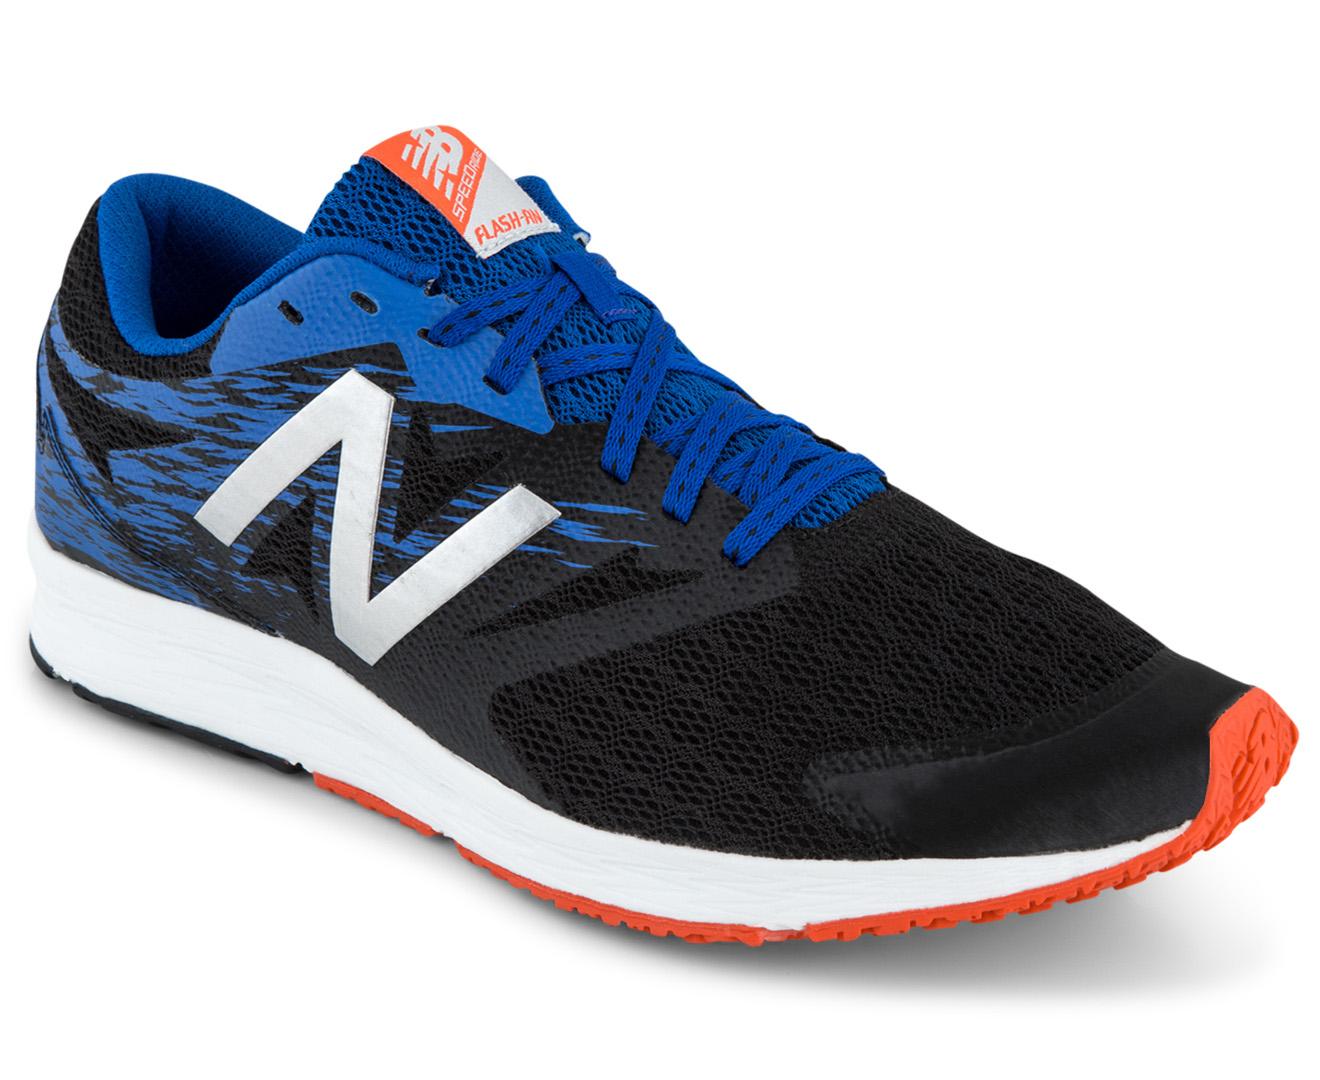 New Balance Men S Flash Running Shoe Black Team Royal